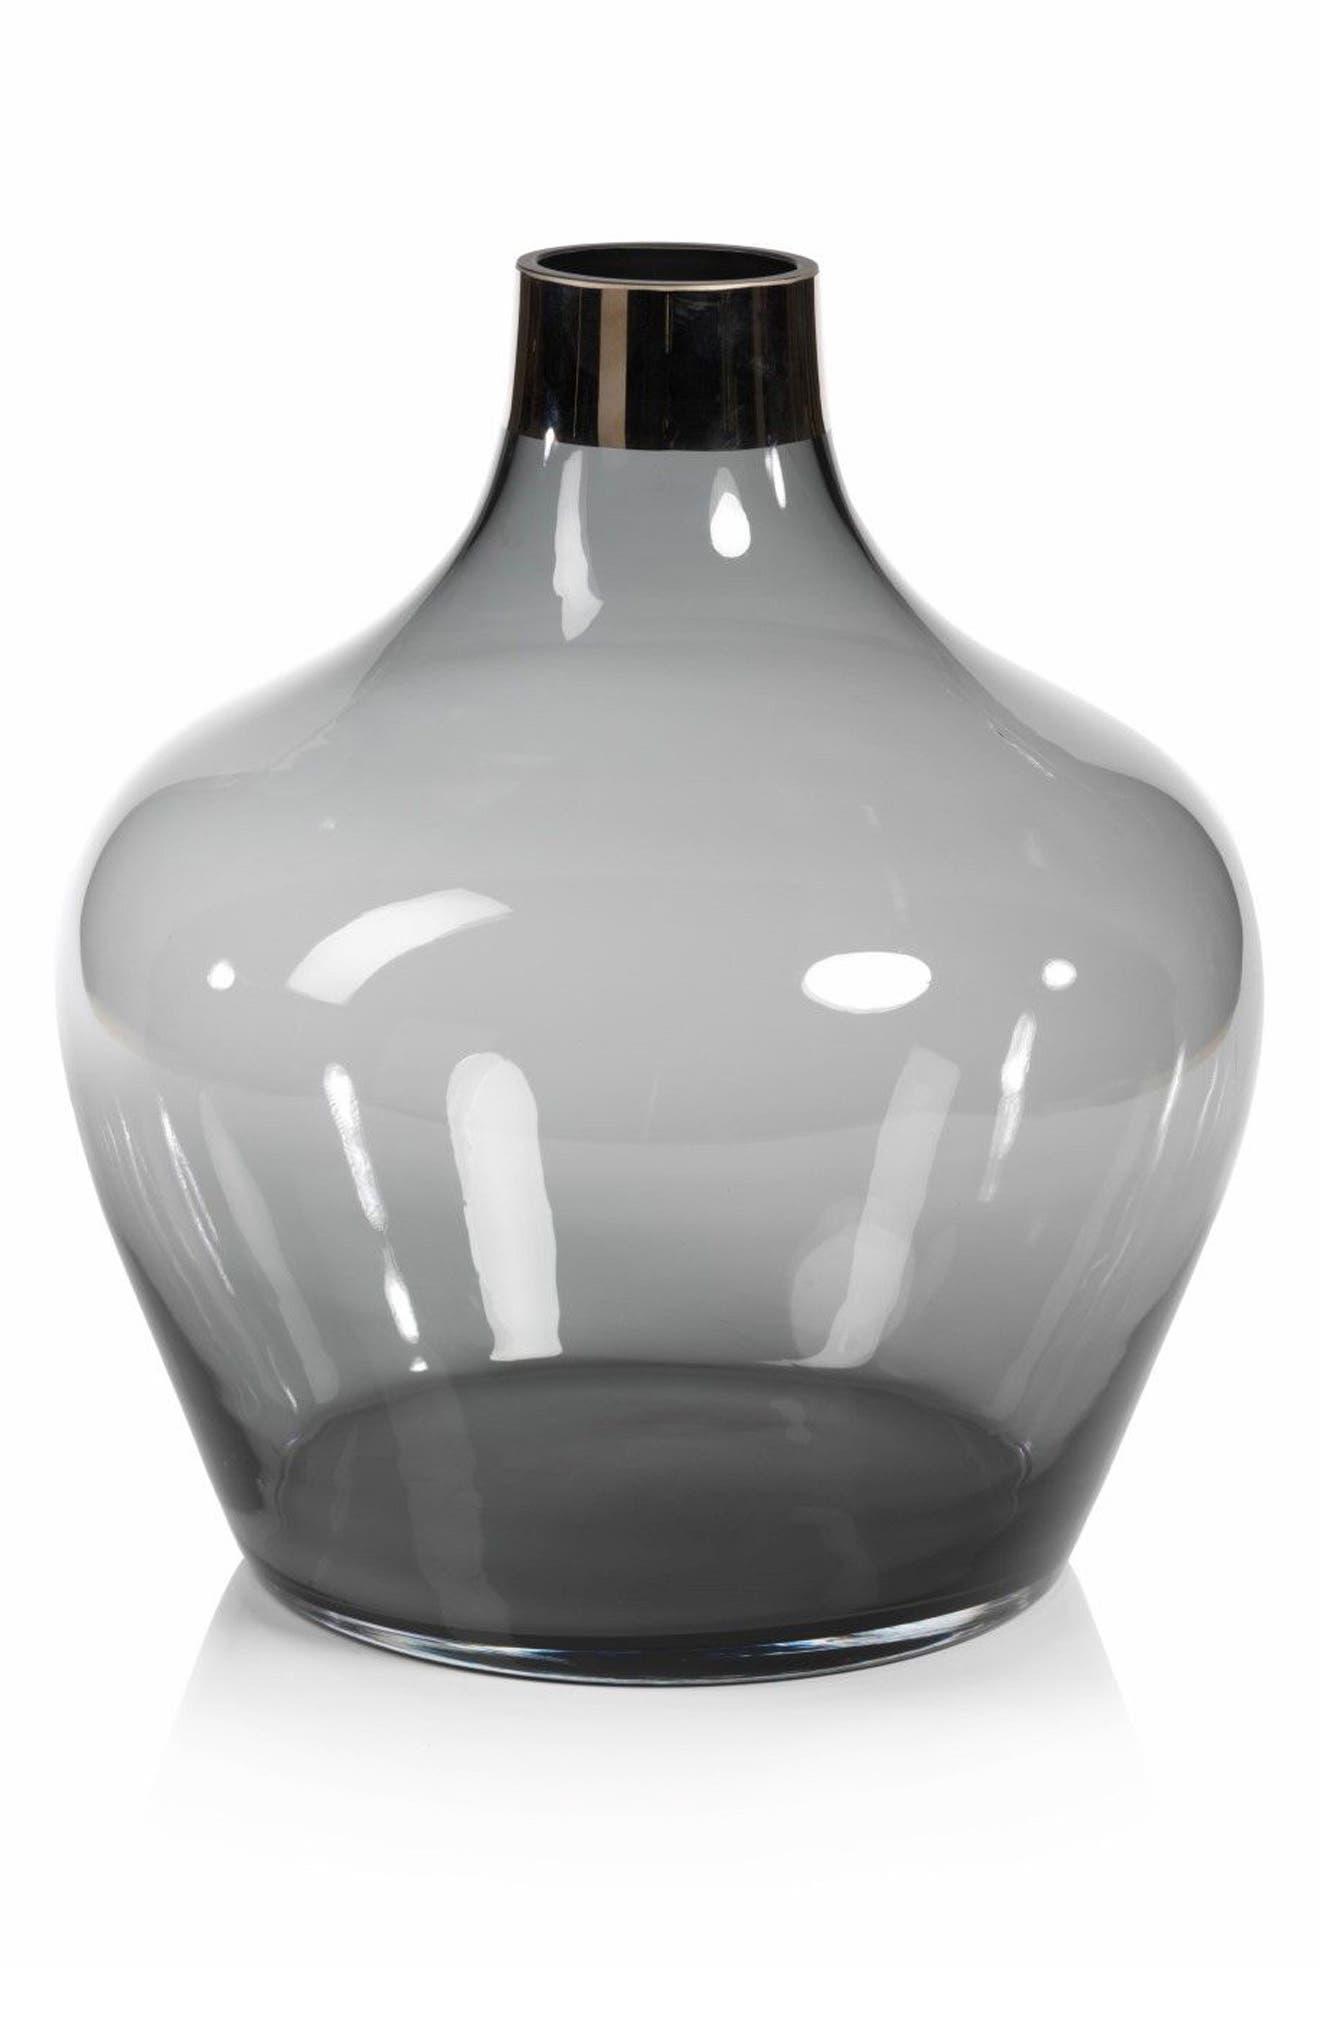 Capo Glass Vase,                             Main thumbnail 1, color,                             100